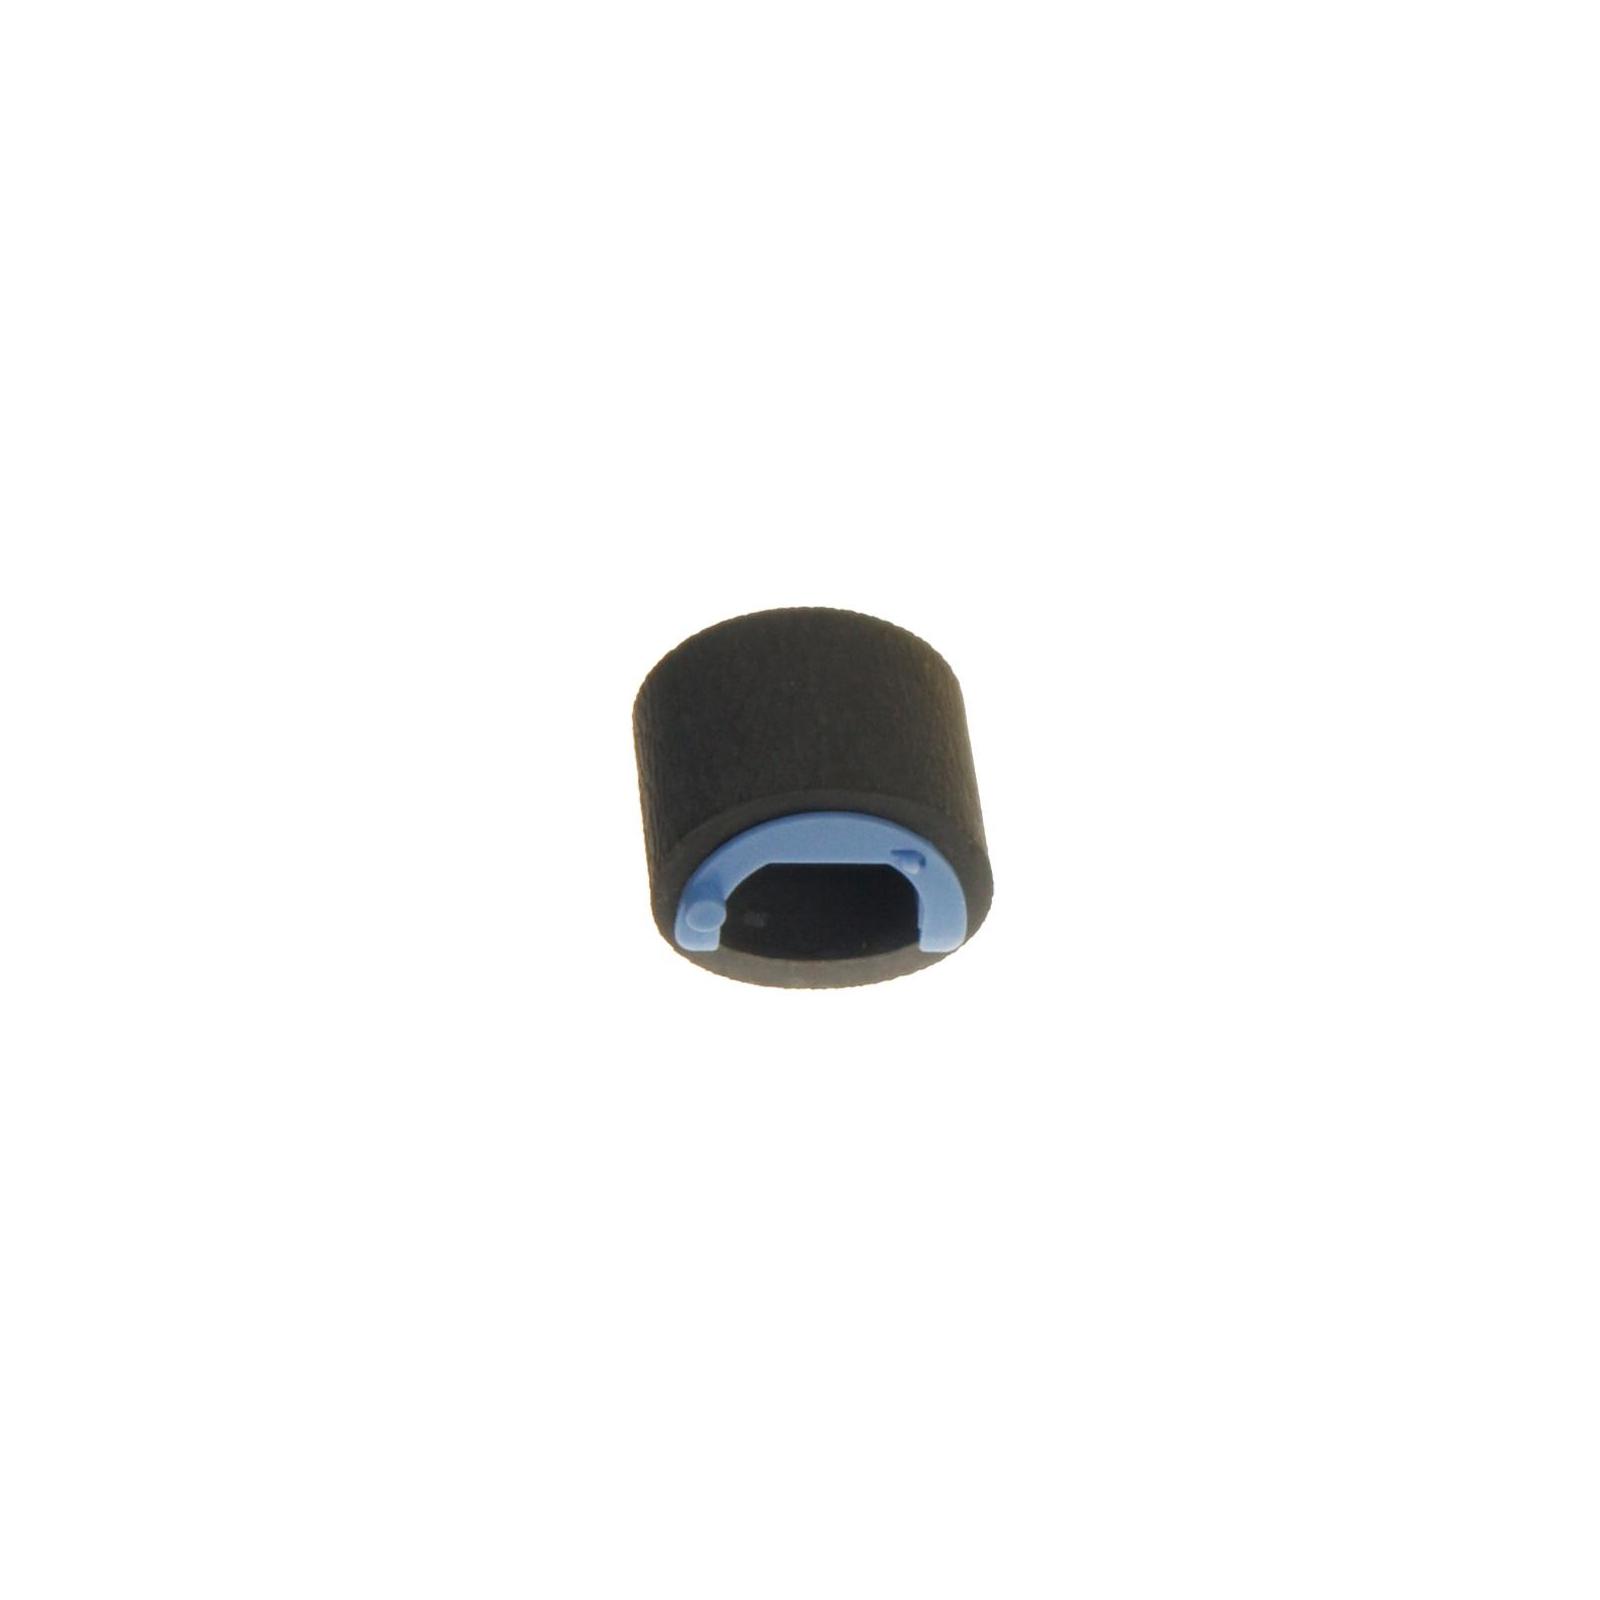 Ролик захвата бумаги HP LJ P1102/M1132/M1217 RL1-2593-000 Foshan (WWMID-84432)